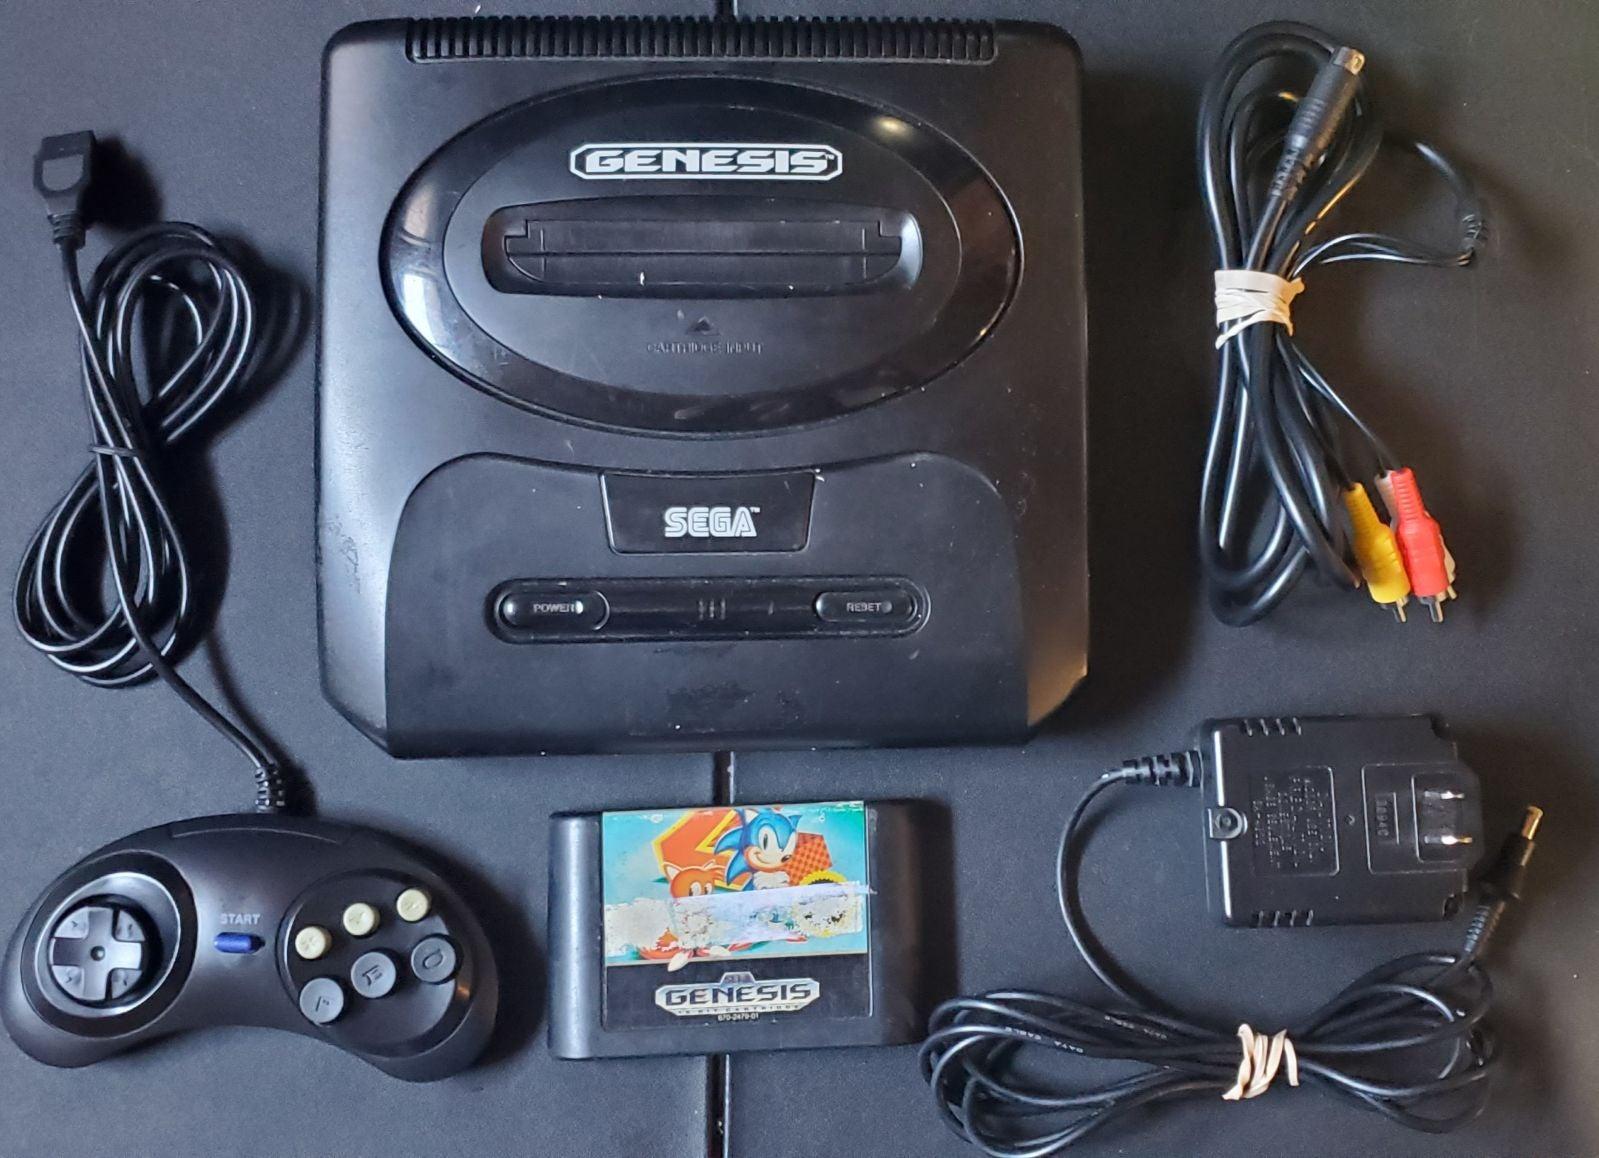 Sega Genesis Model 2 Complete w/ Sonic 2